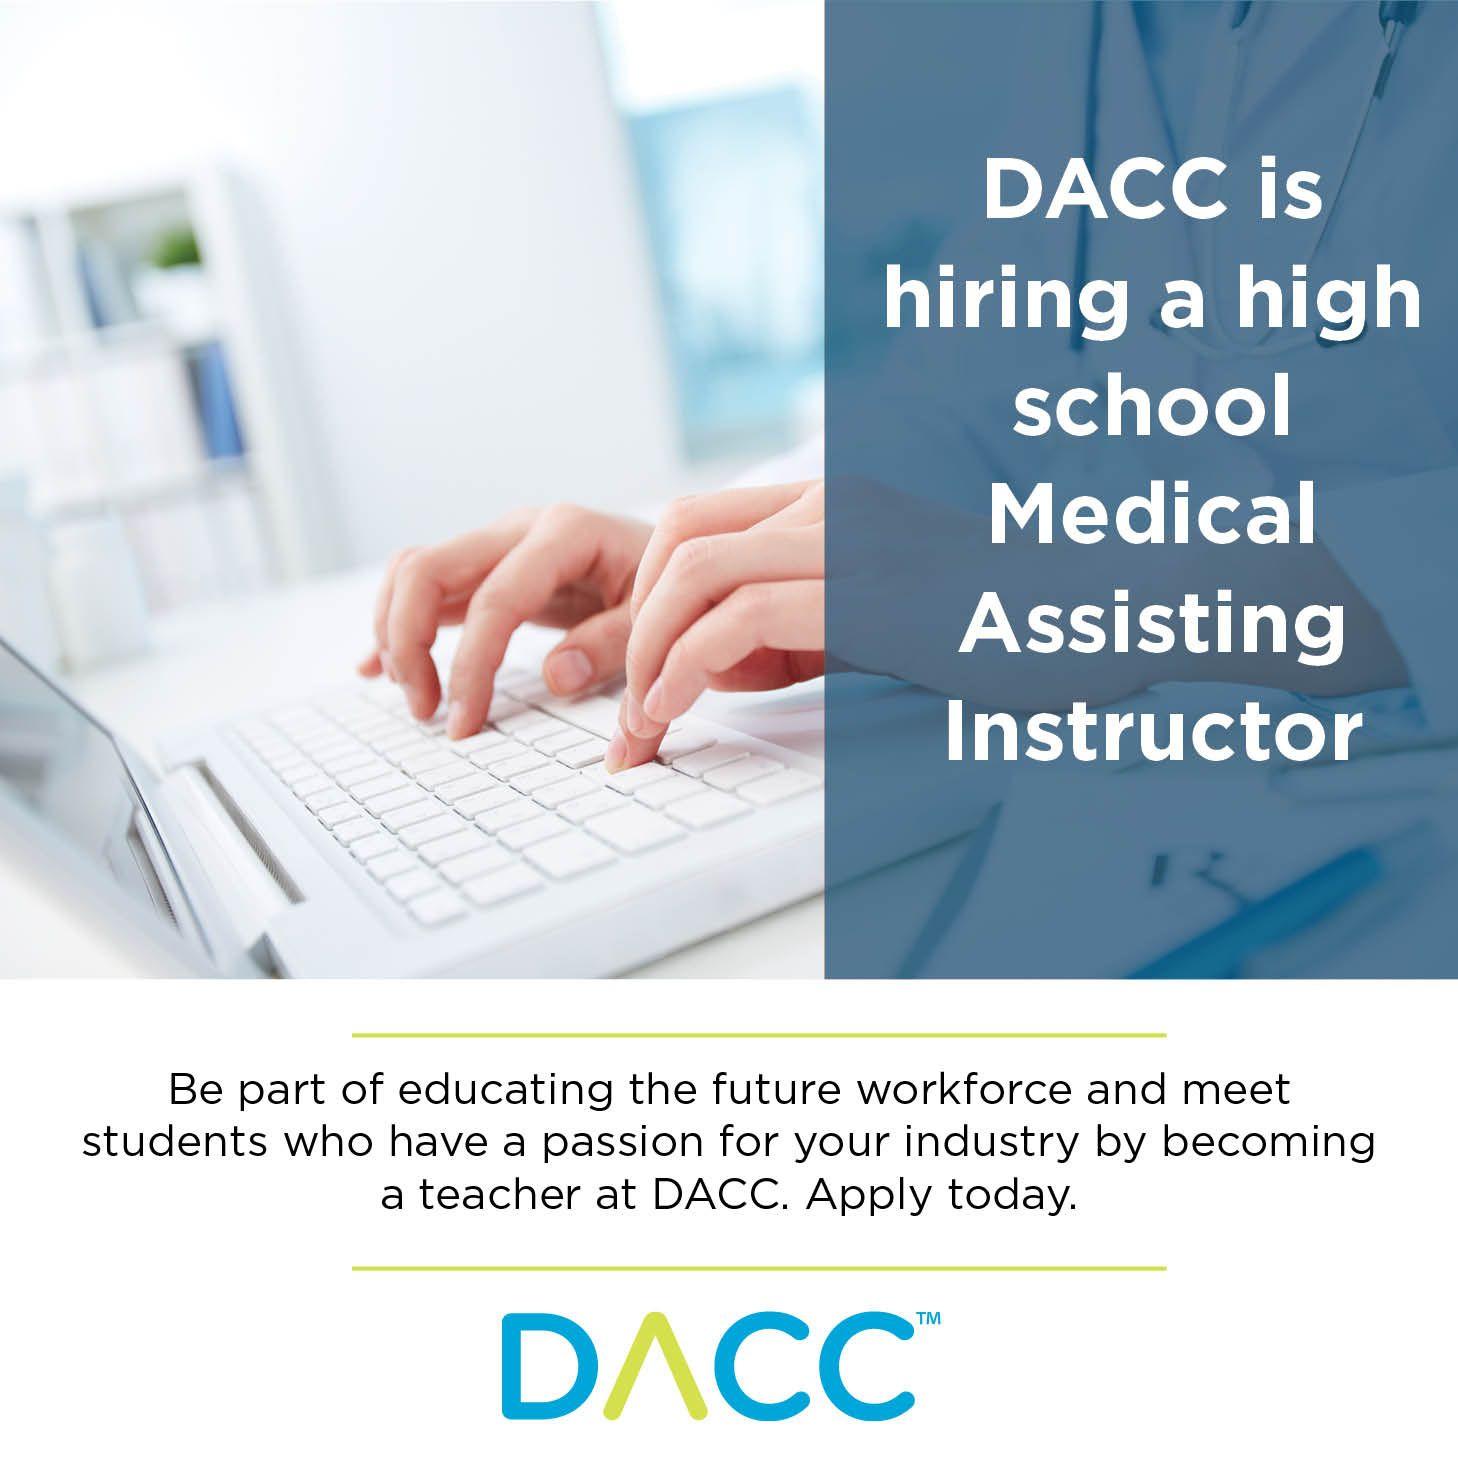 DACC teachers understand the importance of combining tech